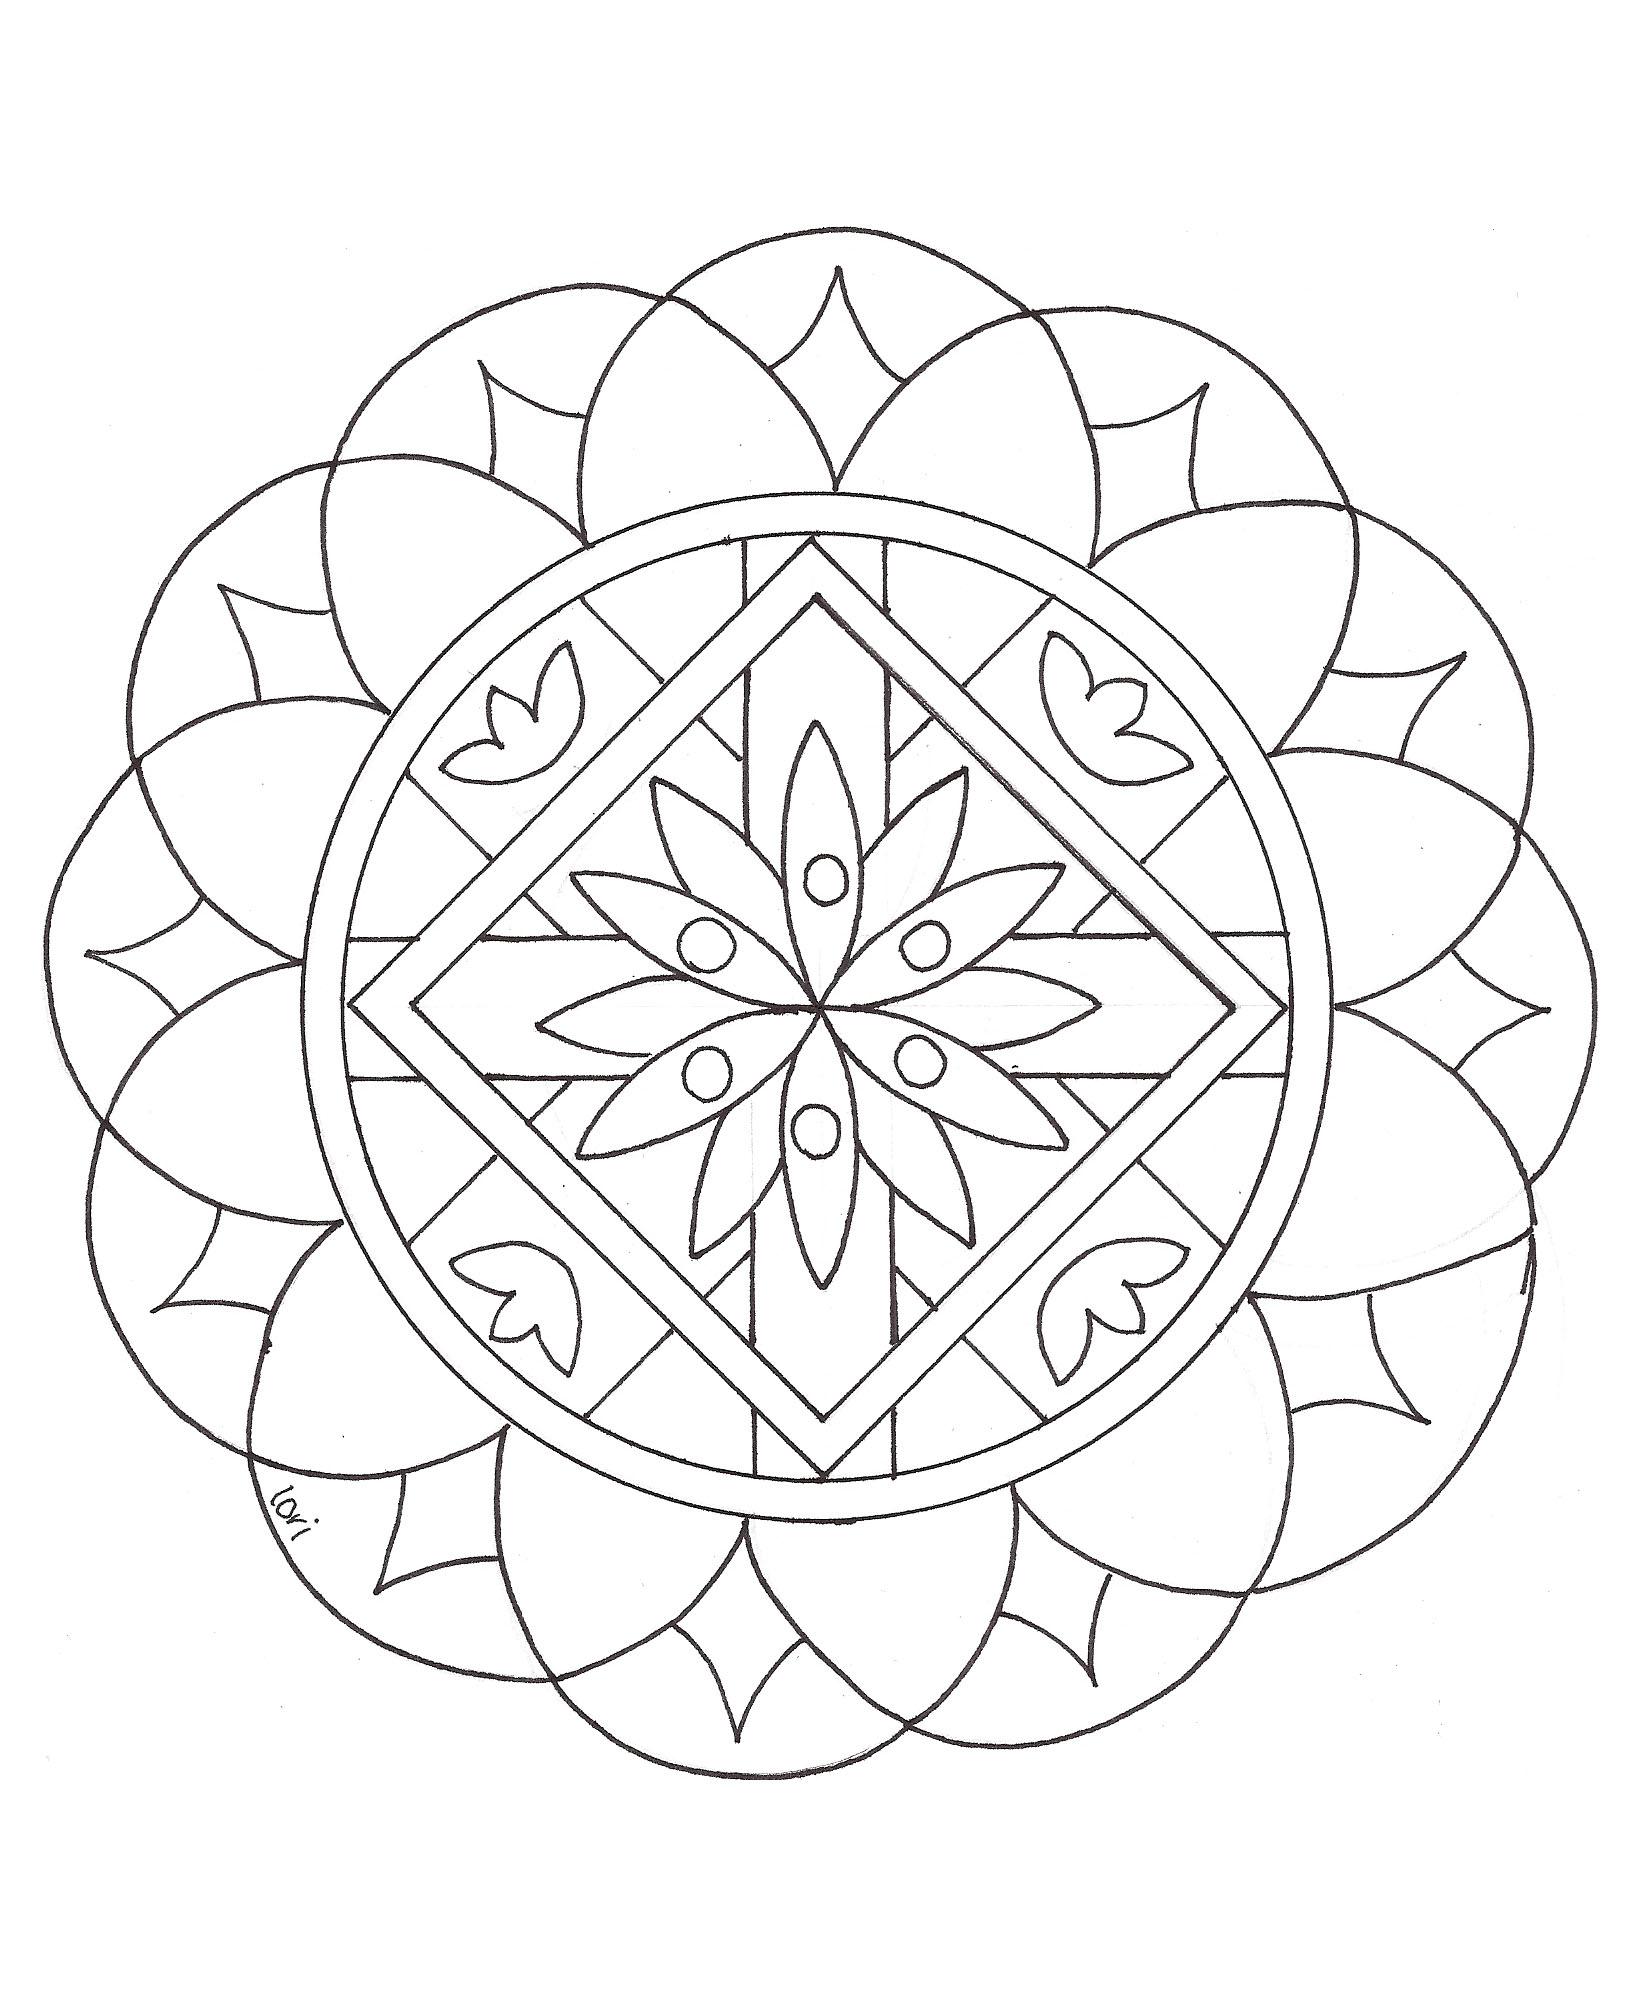 Mandalas To Color For Children